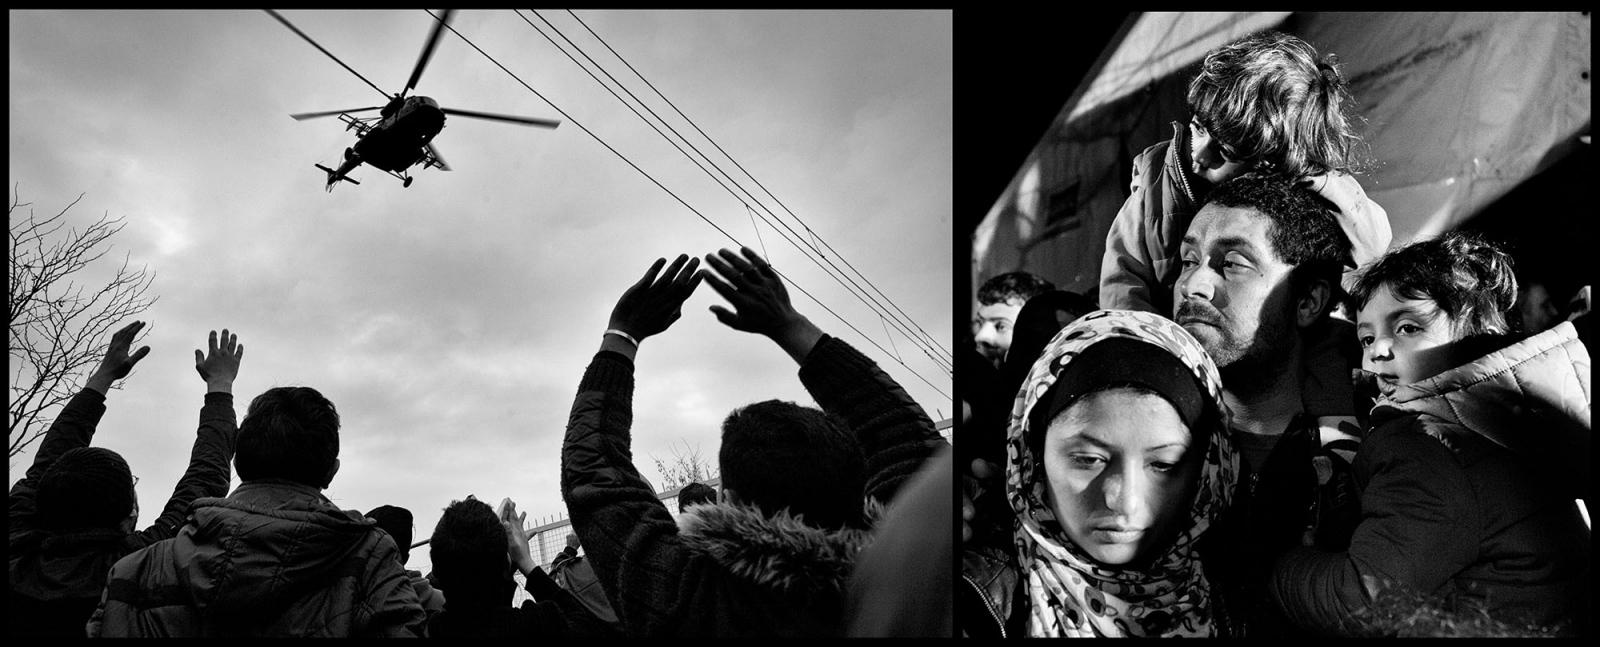 Art and Documentary Photography - Loading Nikos_Pilos_Stern_Goethe_institute_024.jpg